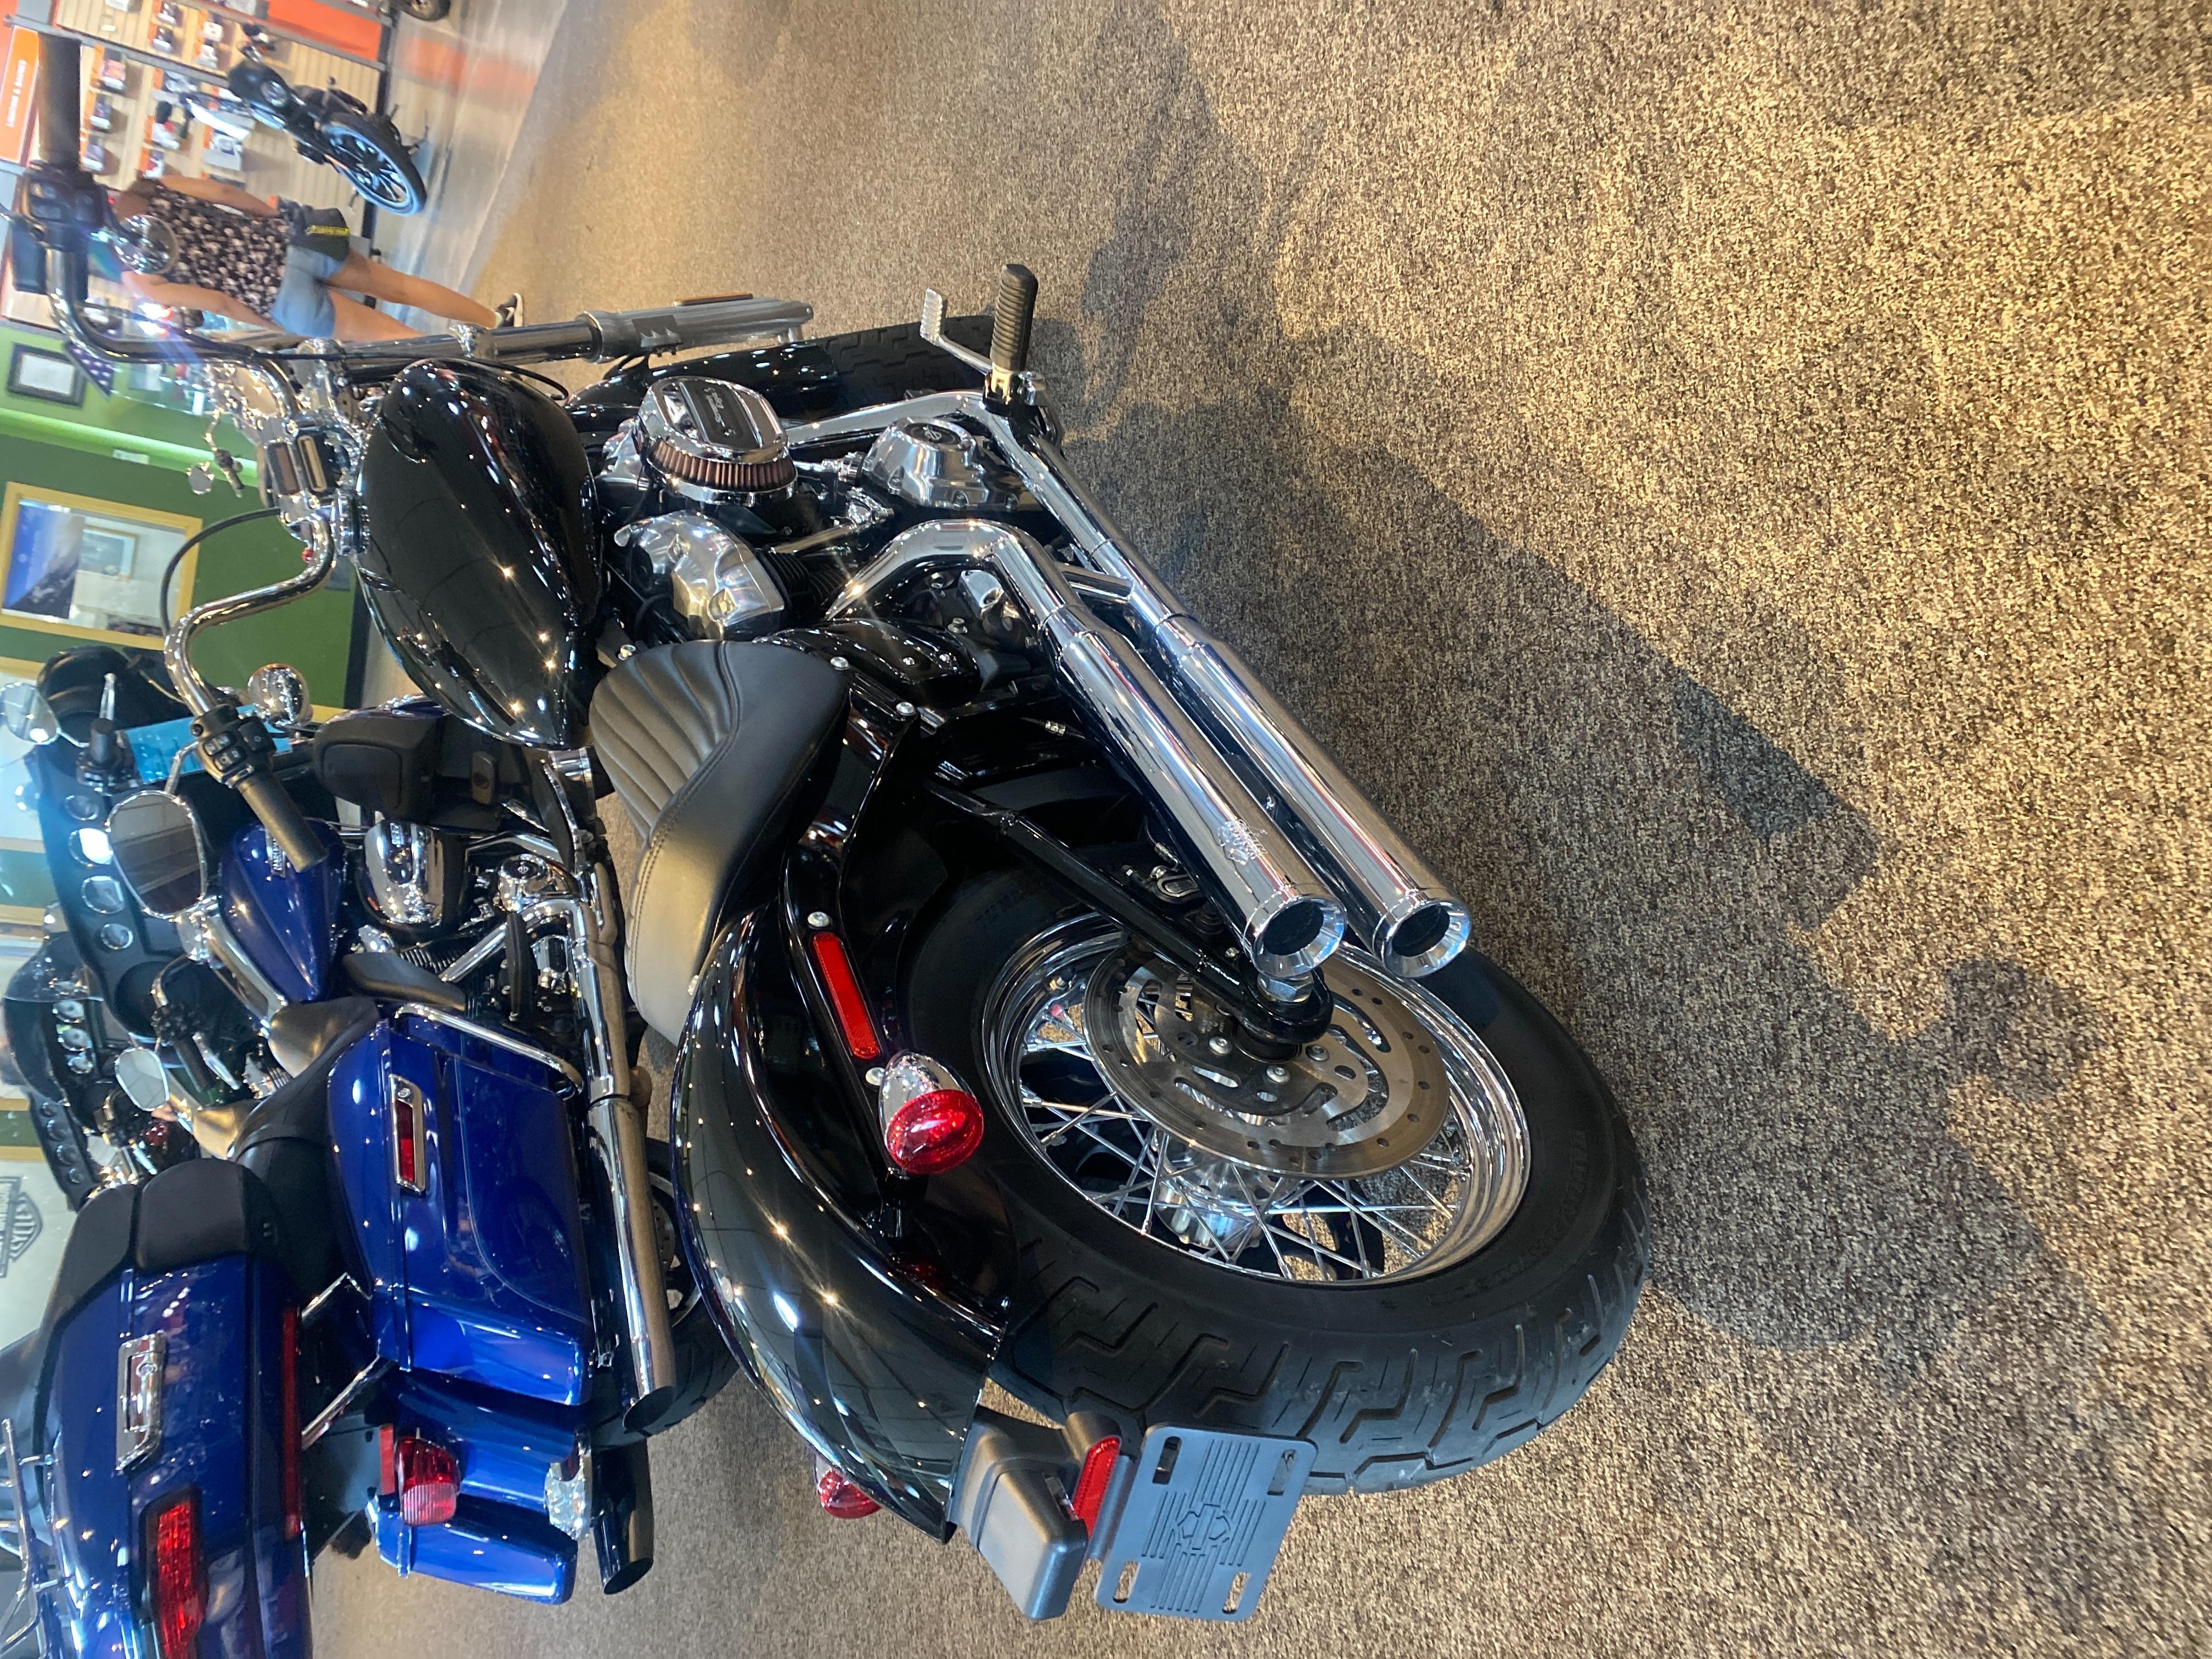 2020 Harley-Davidson Softail Standard at Outpost Harley-Davidson